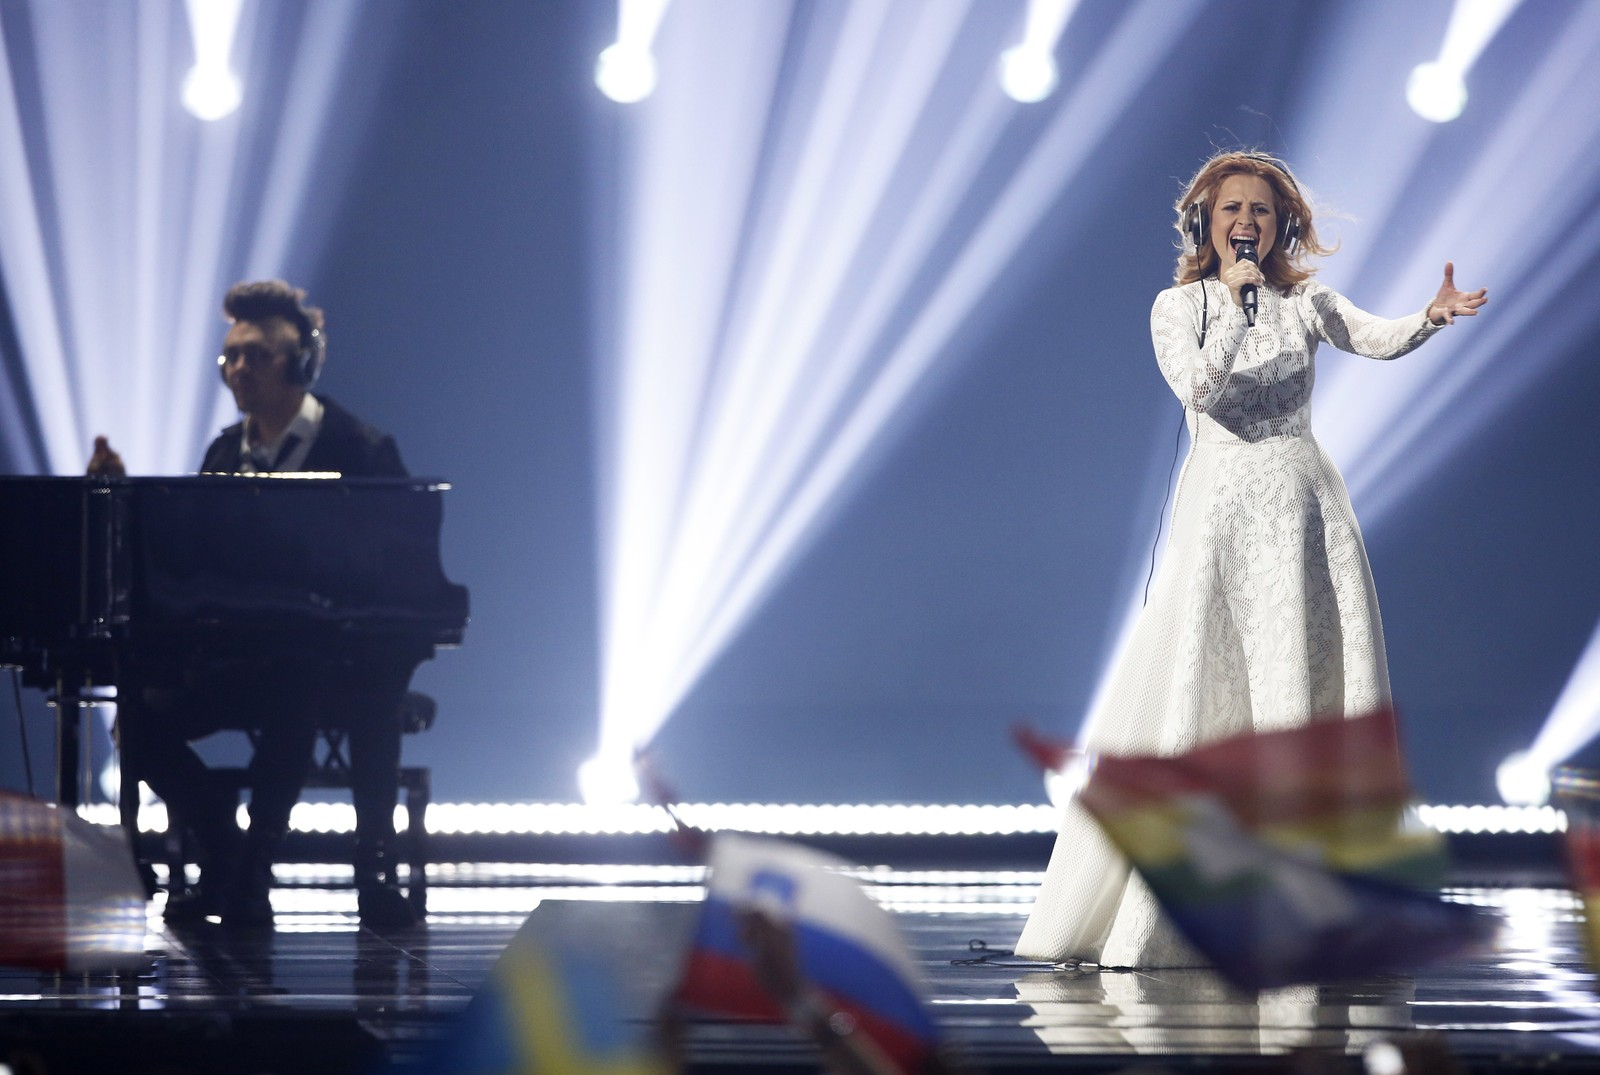 1. SLOVENIA: Slovenia stiller med indie/pop-duoen Maraaya og komponist Raay med låten «Here for You».